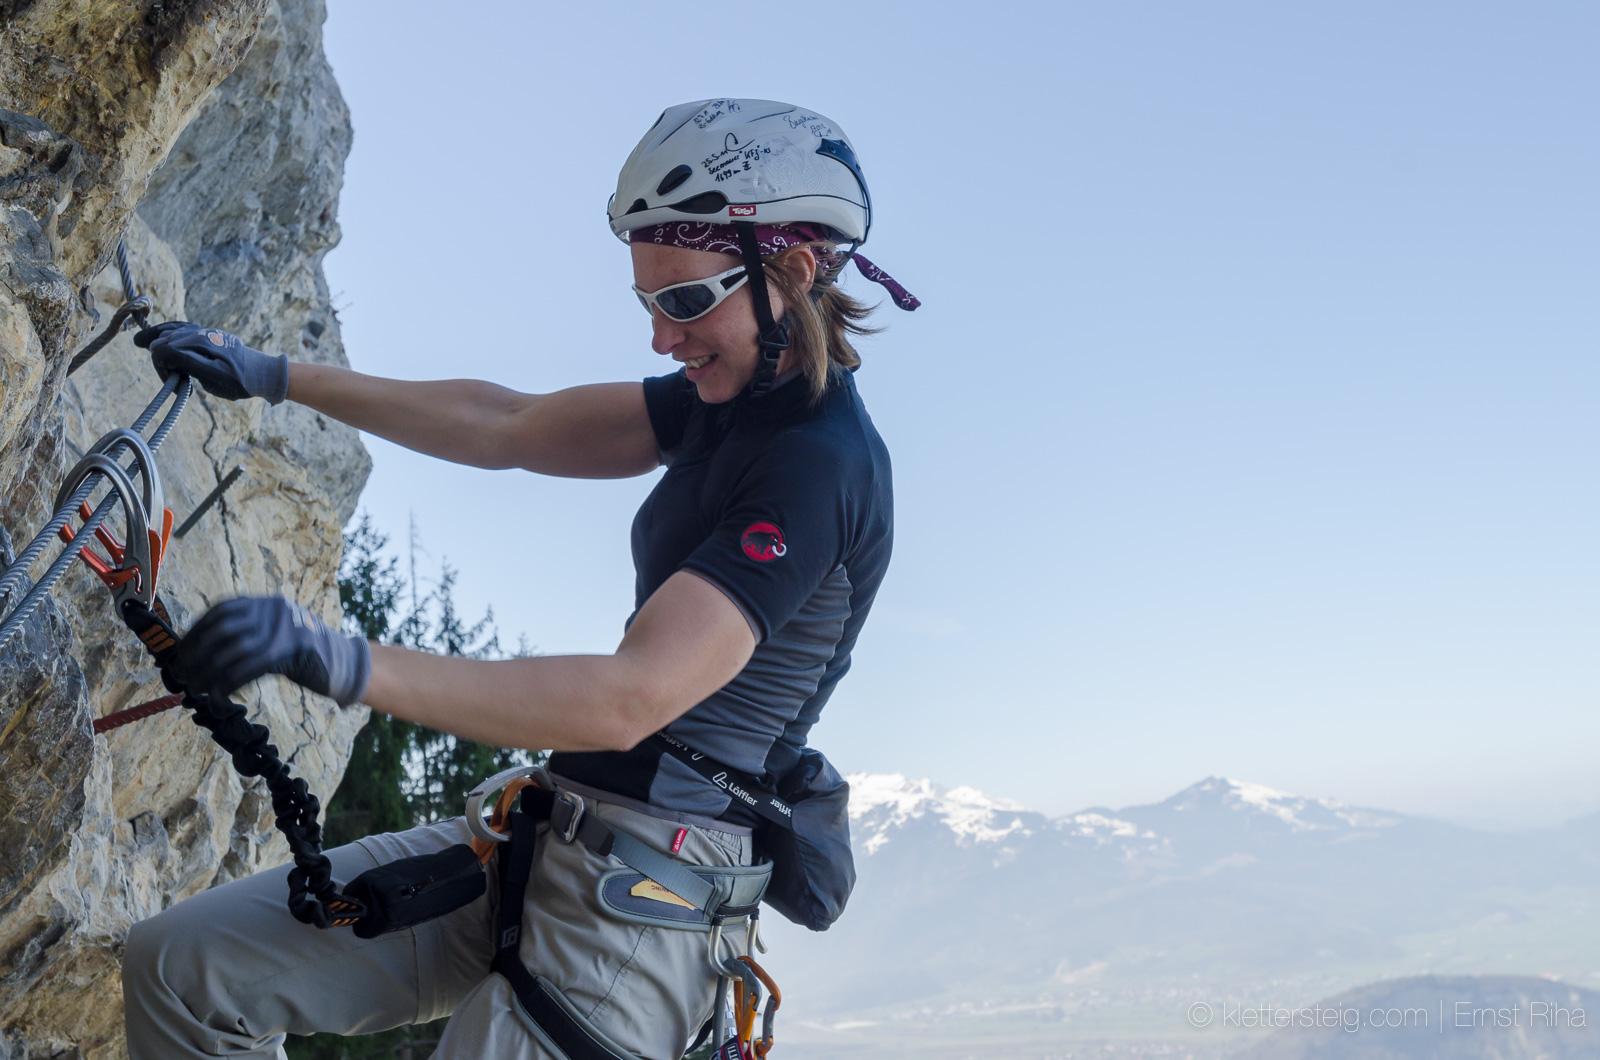 Klettersteig Via Kapf : Klettersteig via kessi kapf götzis vorarlberg youtube